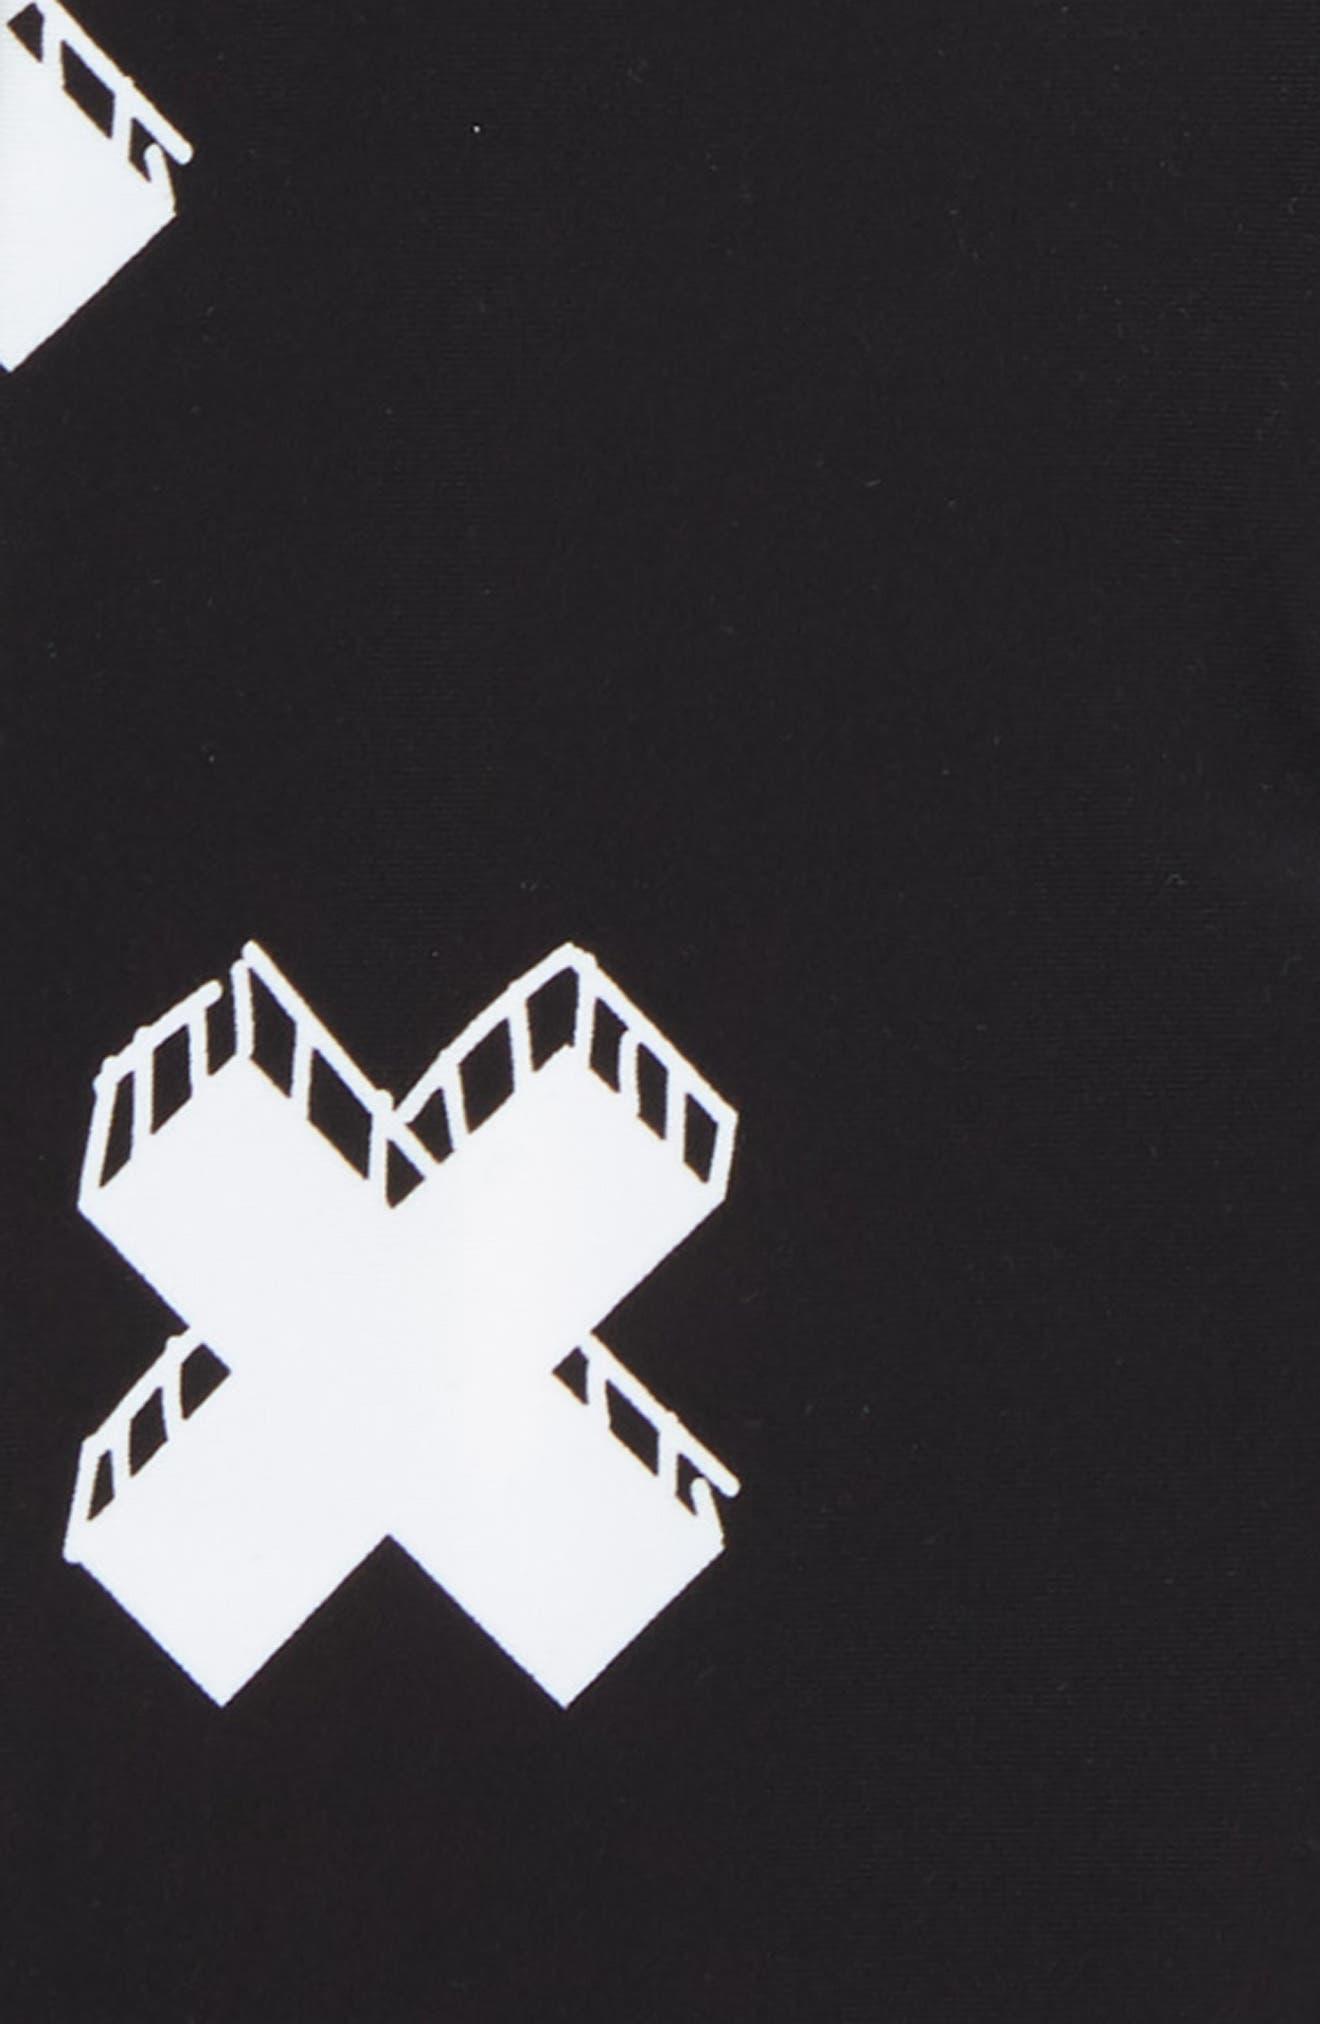 Cross One-Piece Rashguard Swimsuit,                             Alternate thumbnail 2, color,                             WHITE/ BLACK